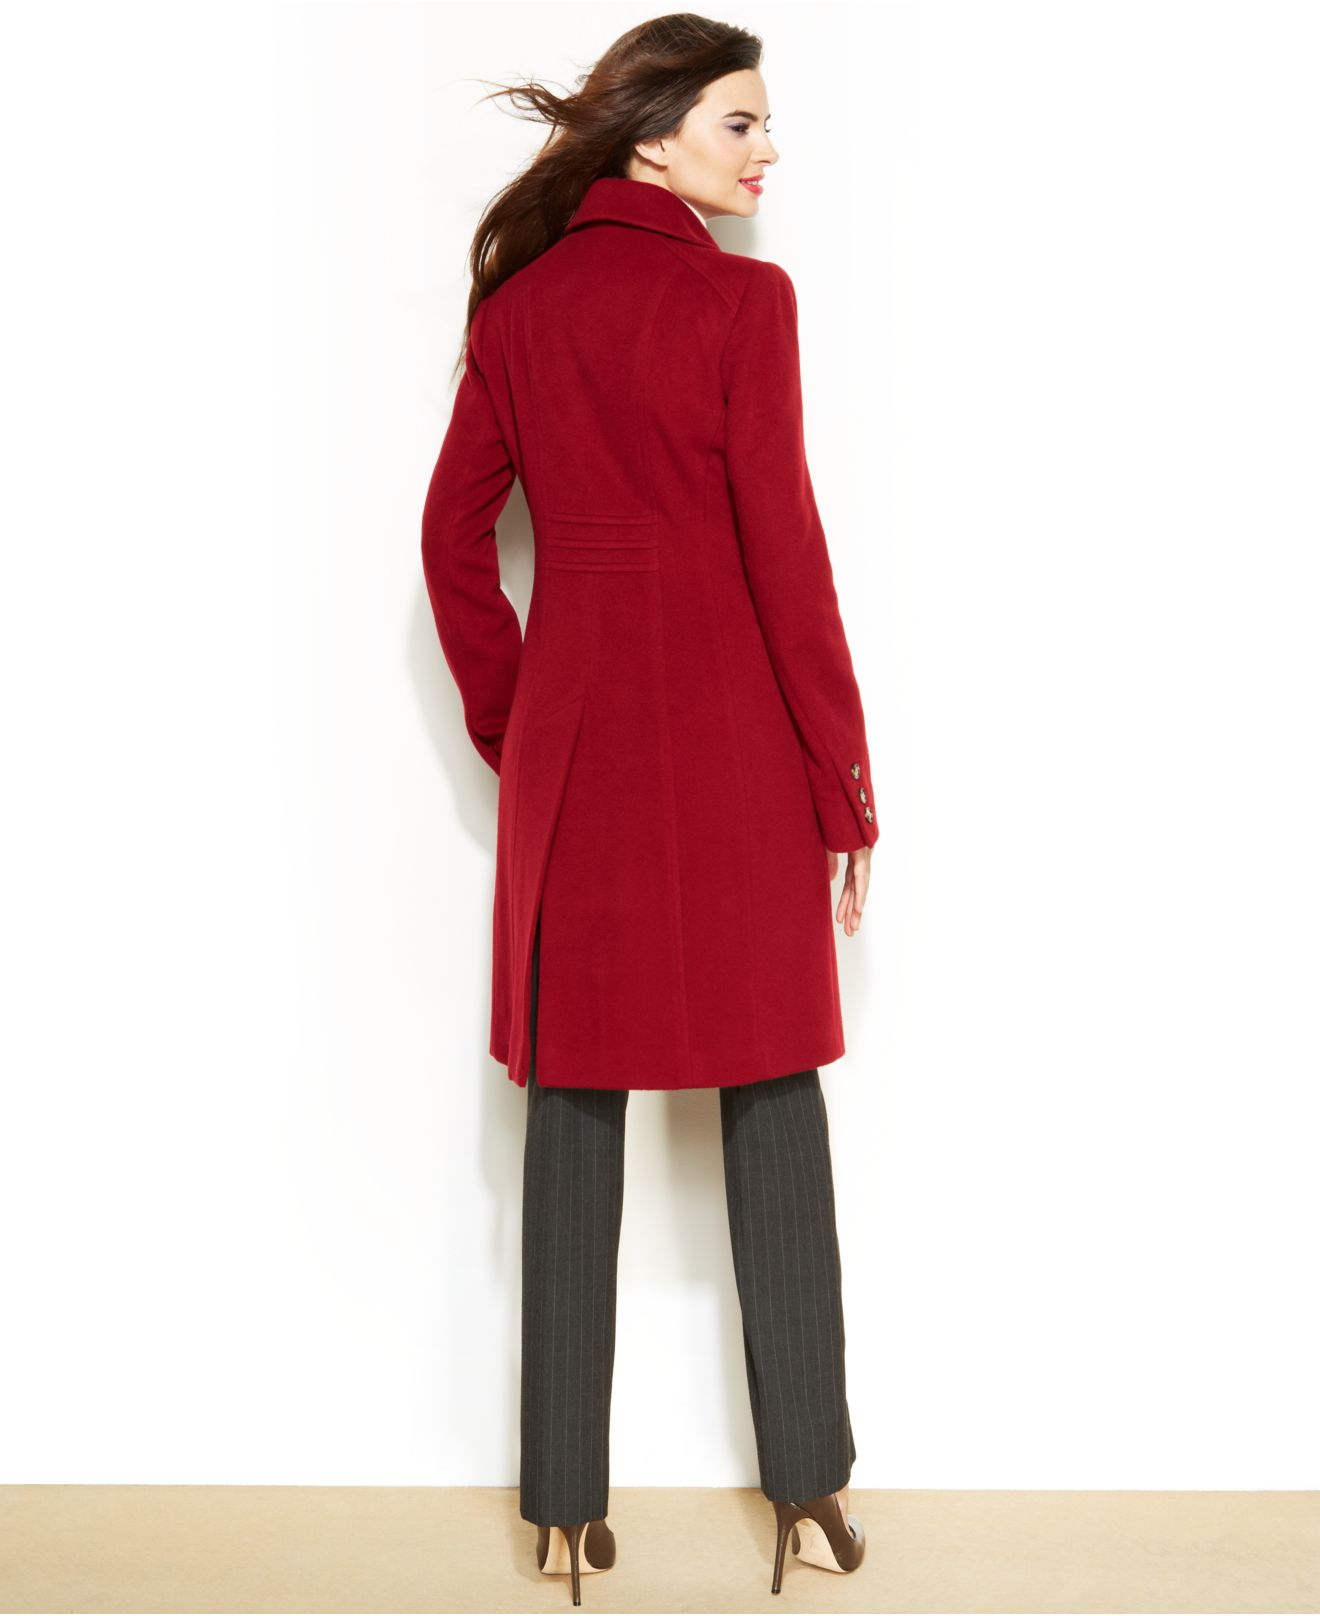 Anne klein Petite Wool-Cashmere-Blend Walker Coat in Red | Lyst